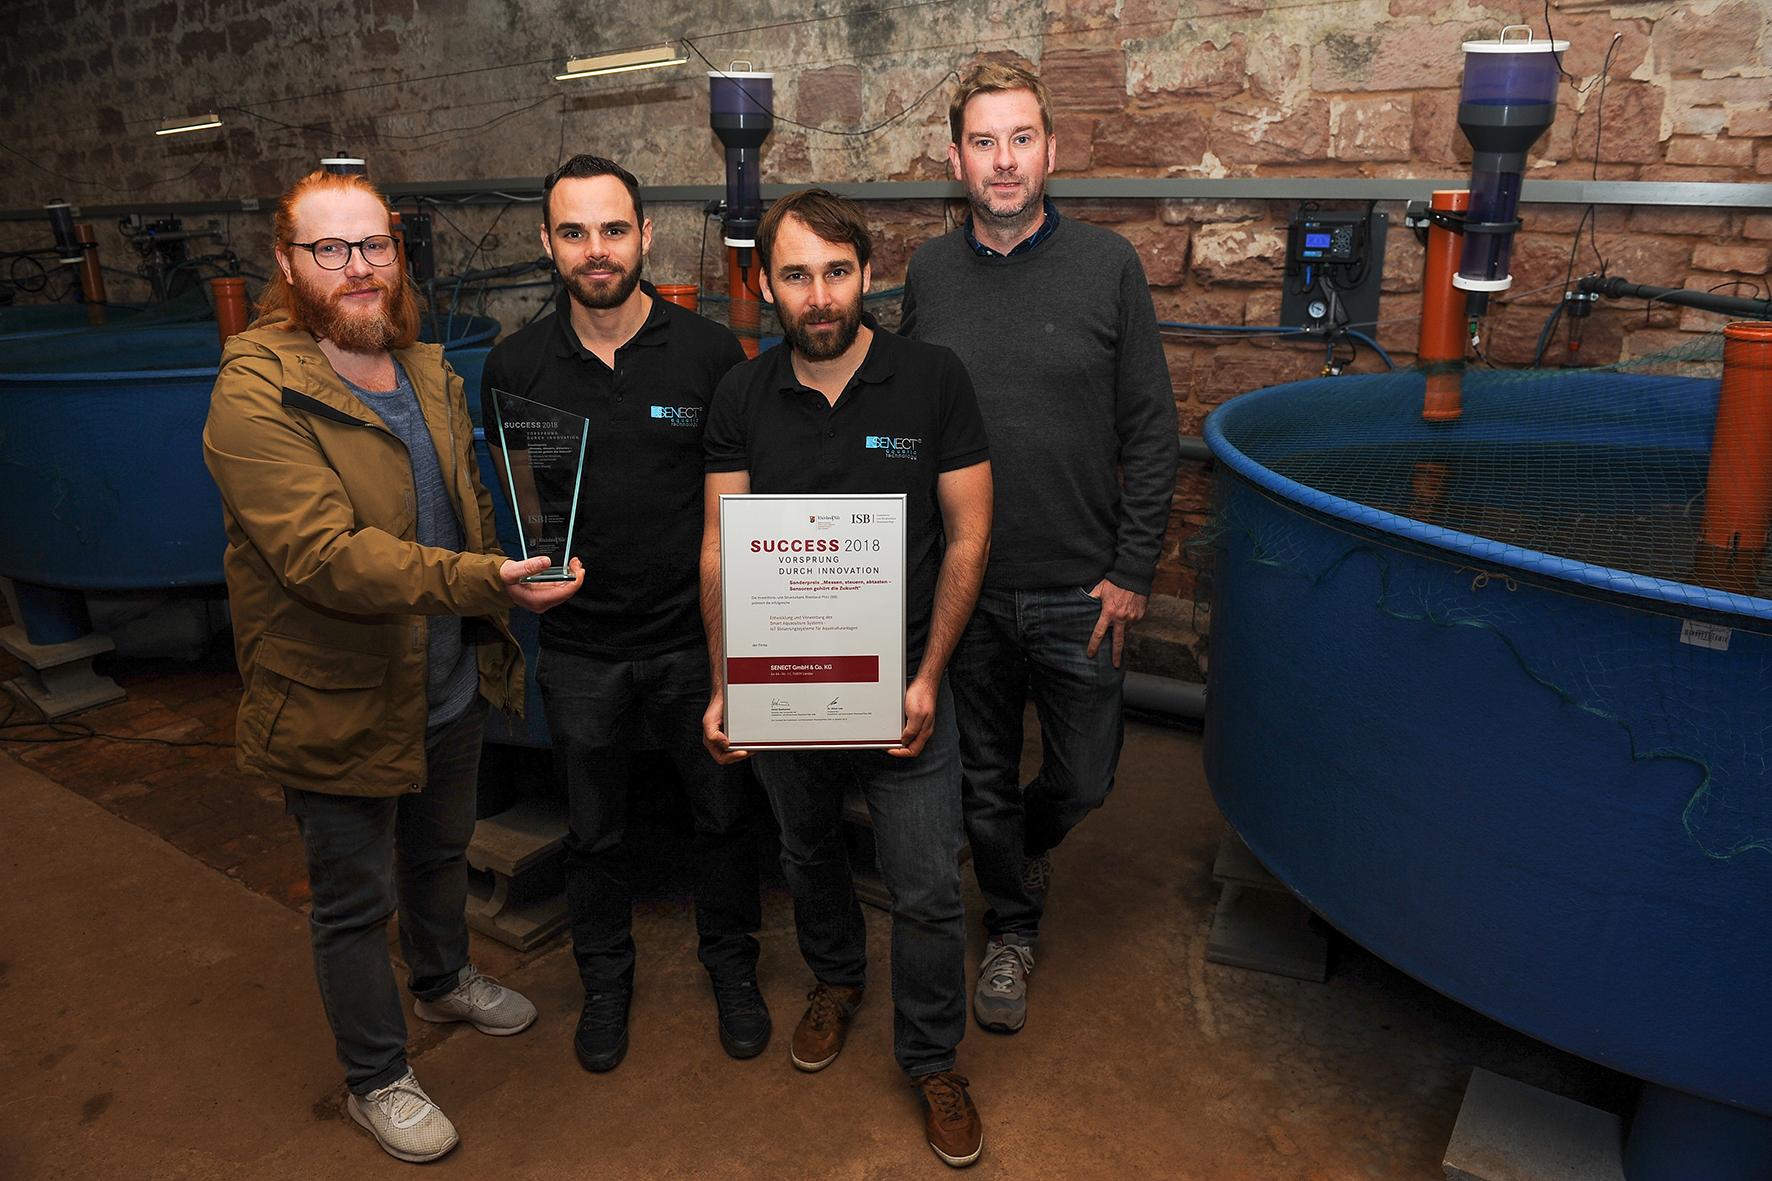 SUCCESS-Sonderpreis für Landauer Gründerteam SENECT